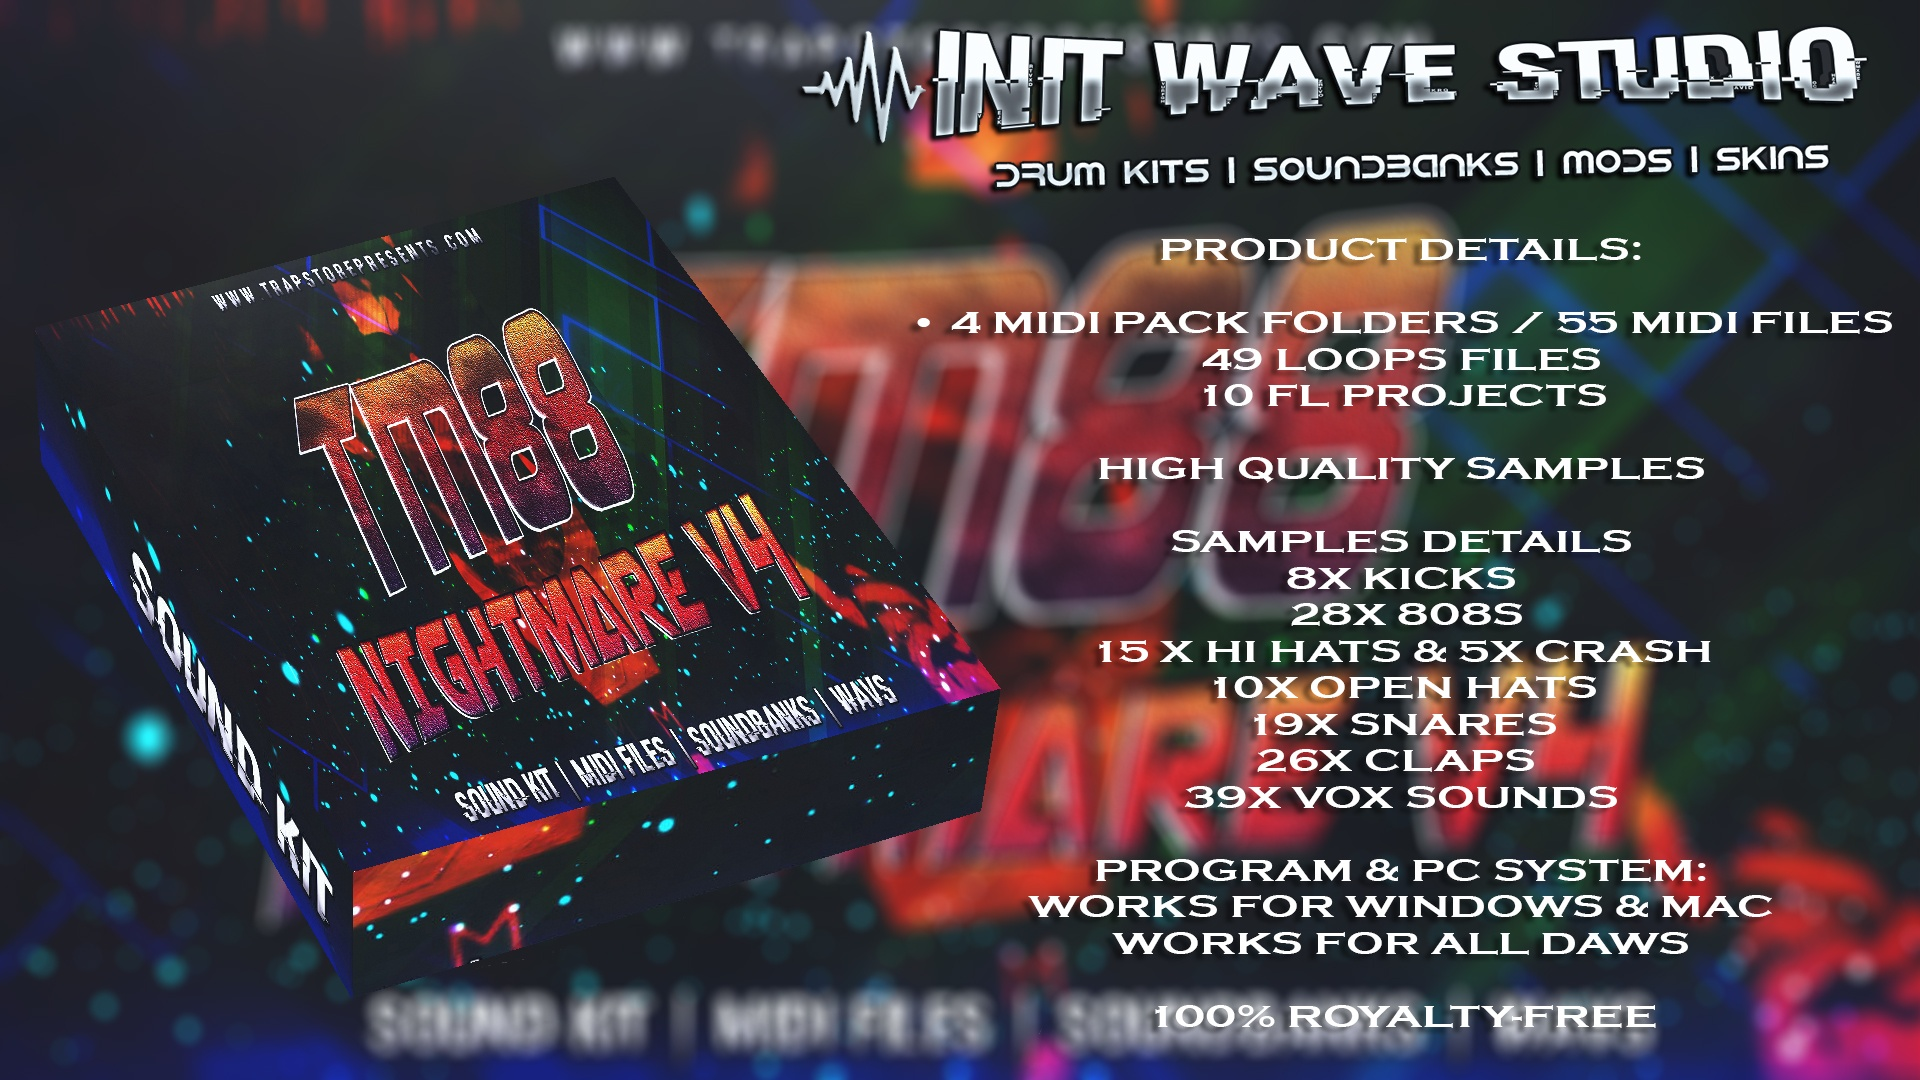 INIT WAVE STUDIO - TM88 NIGHTMARE V4 (WAVS, MIDI, MIXING PRESETS, FLPS, EXPANSIONS)